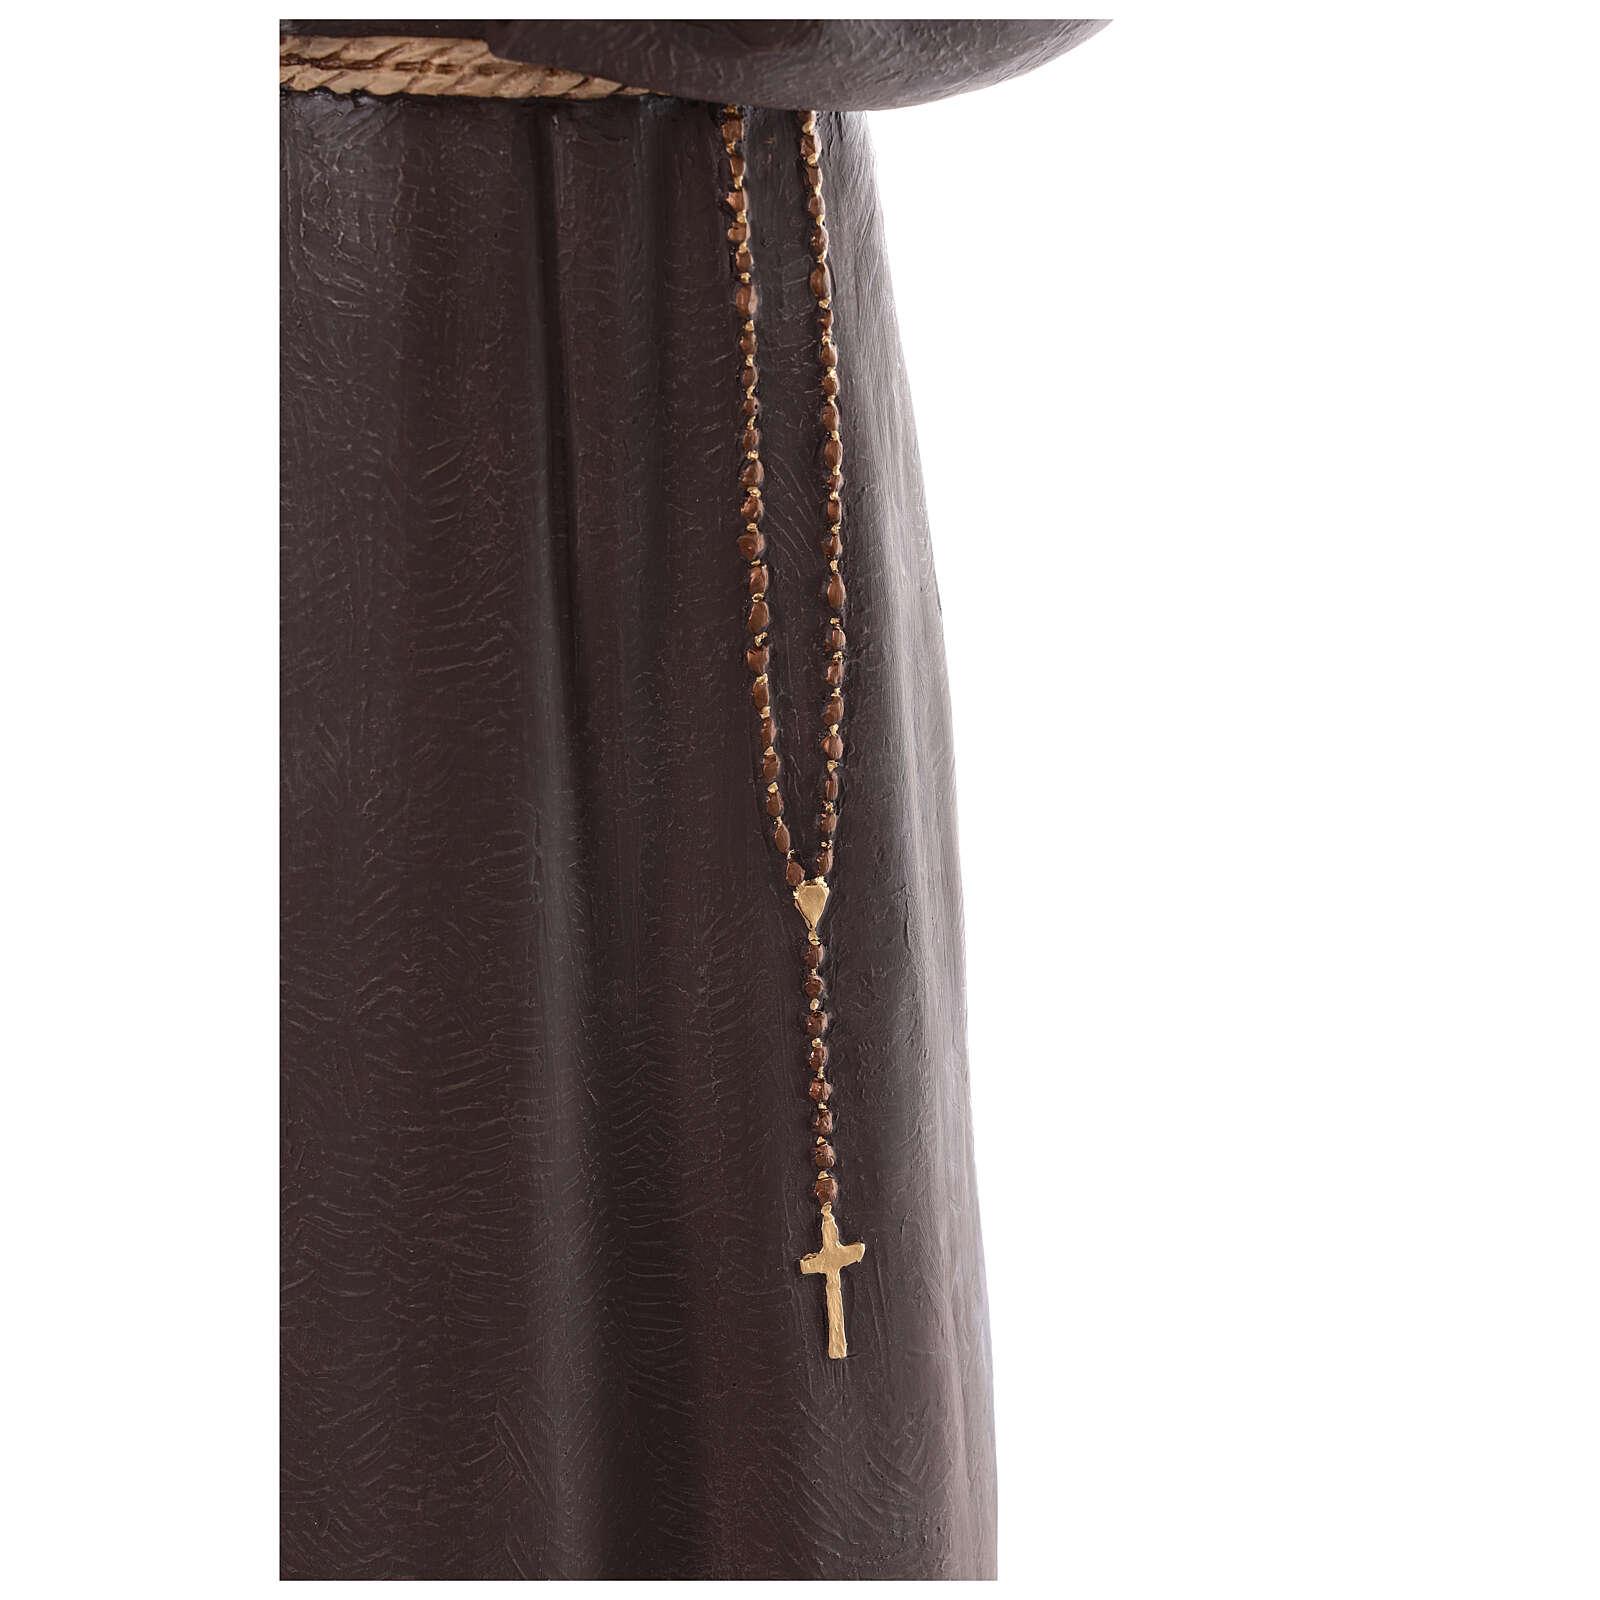 San Padre Pio vetroresina colorata 110 cm occhi vetro 4